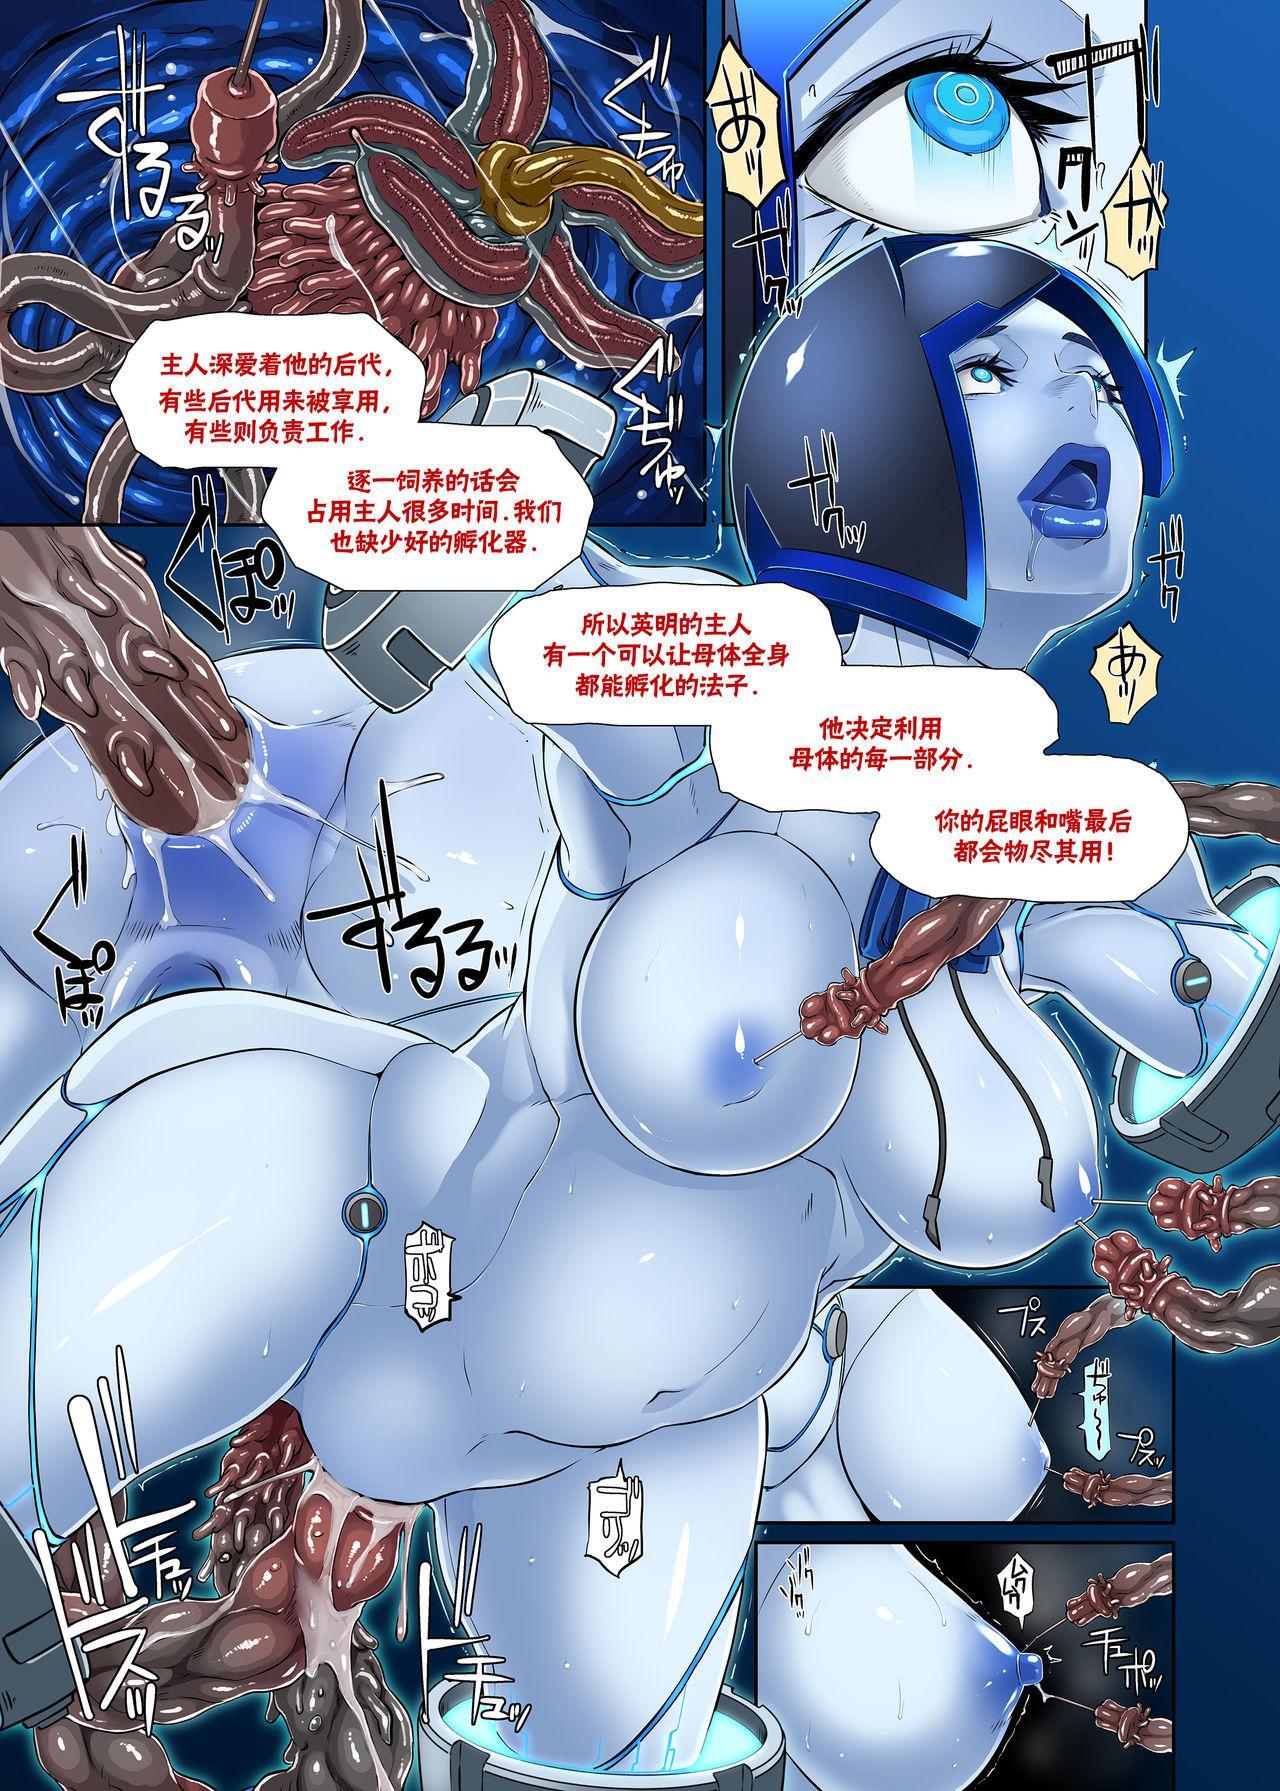 Subverse: The Hatchery 9